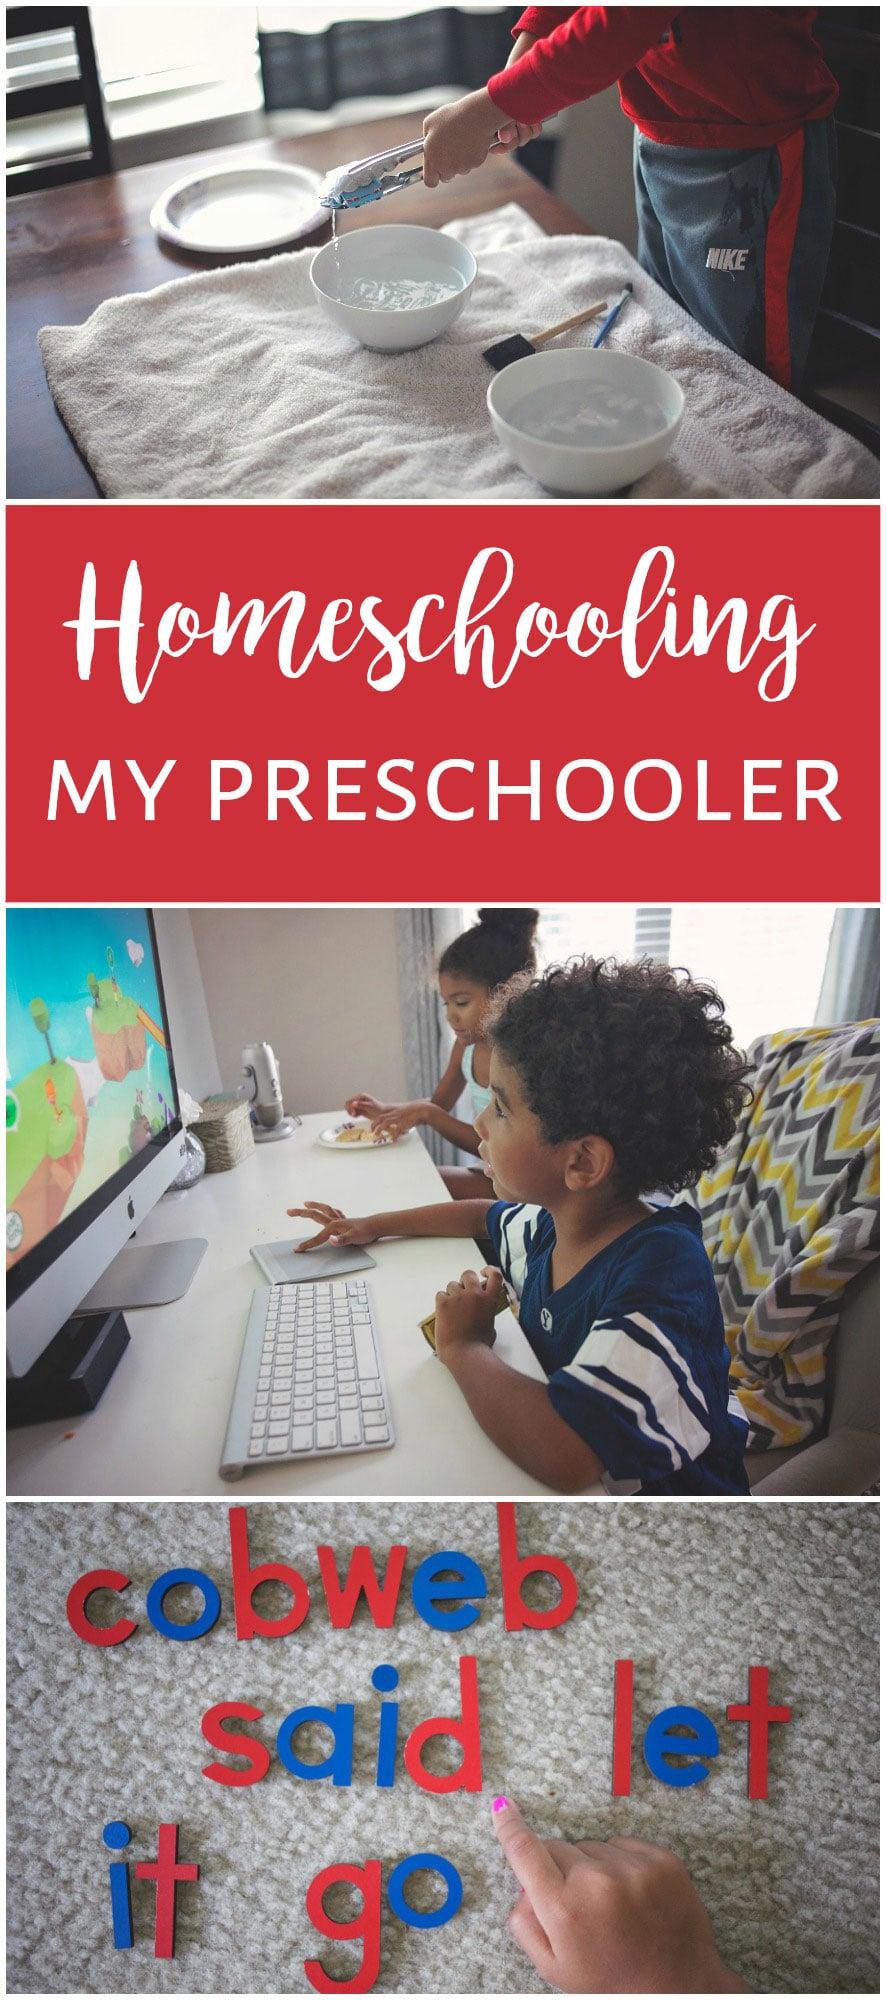 Homeschooling a preschooler.